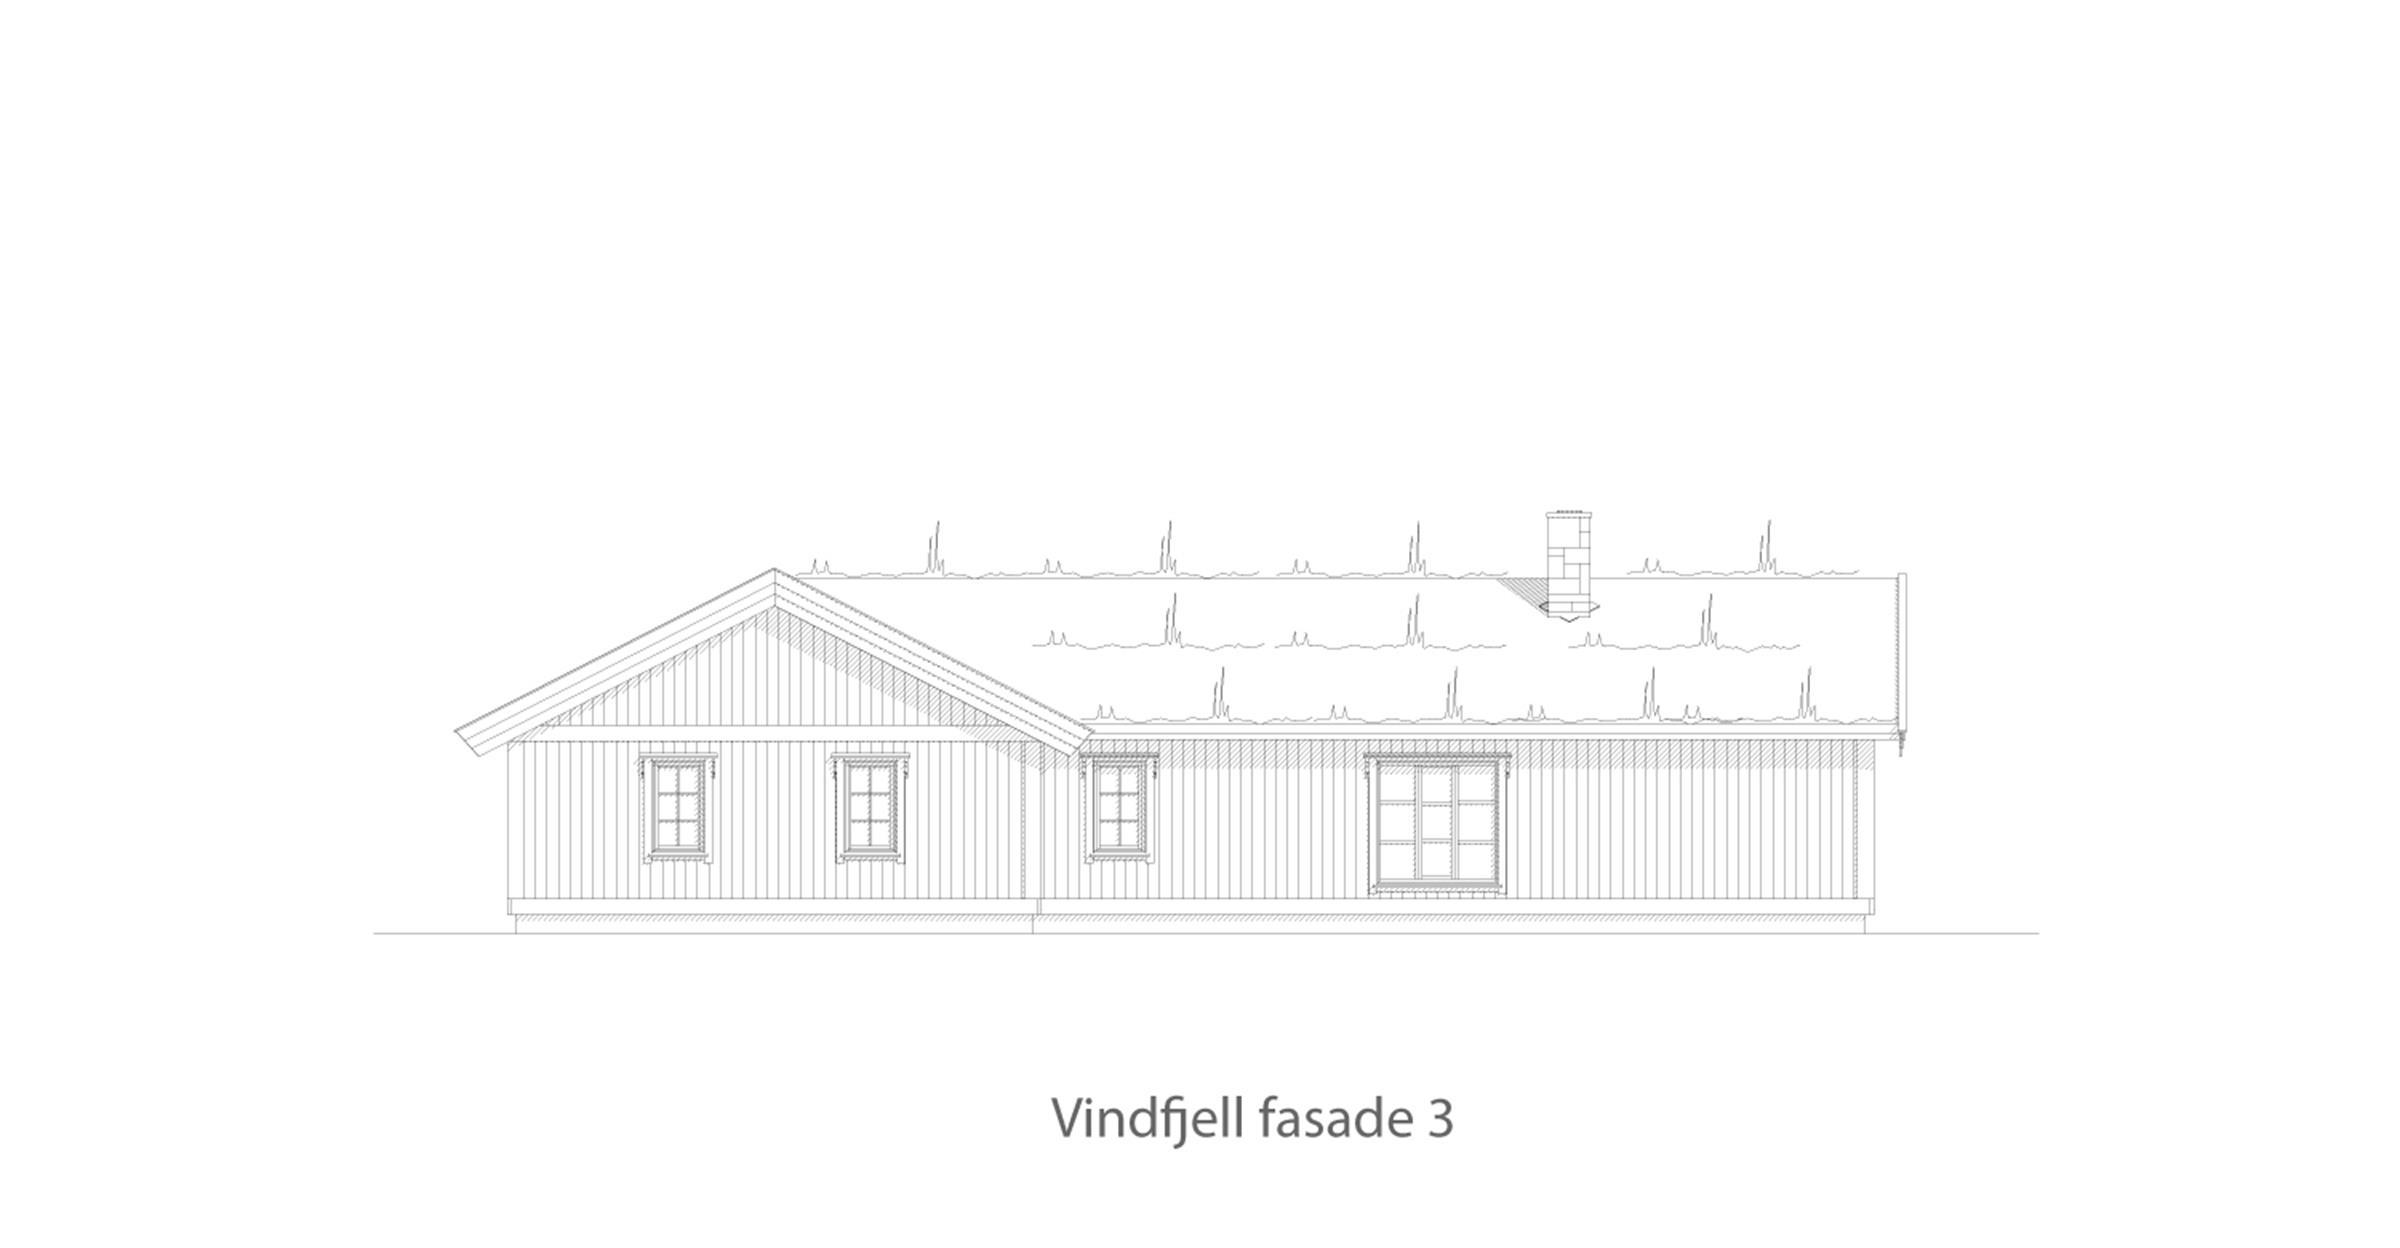 Vindfjell fasade 3